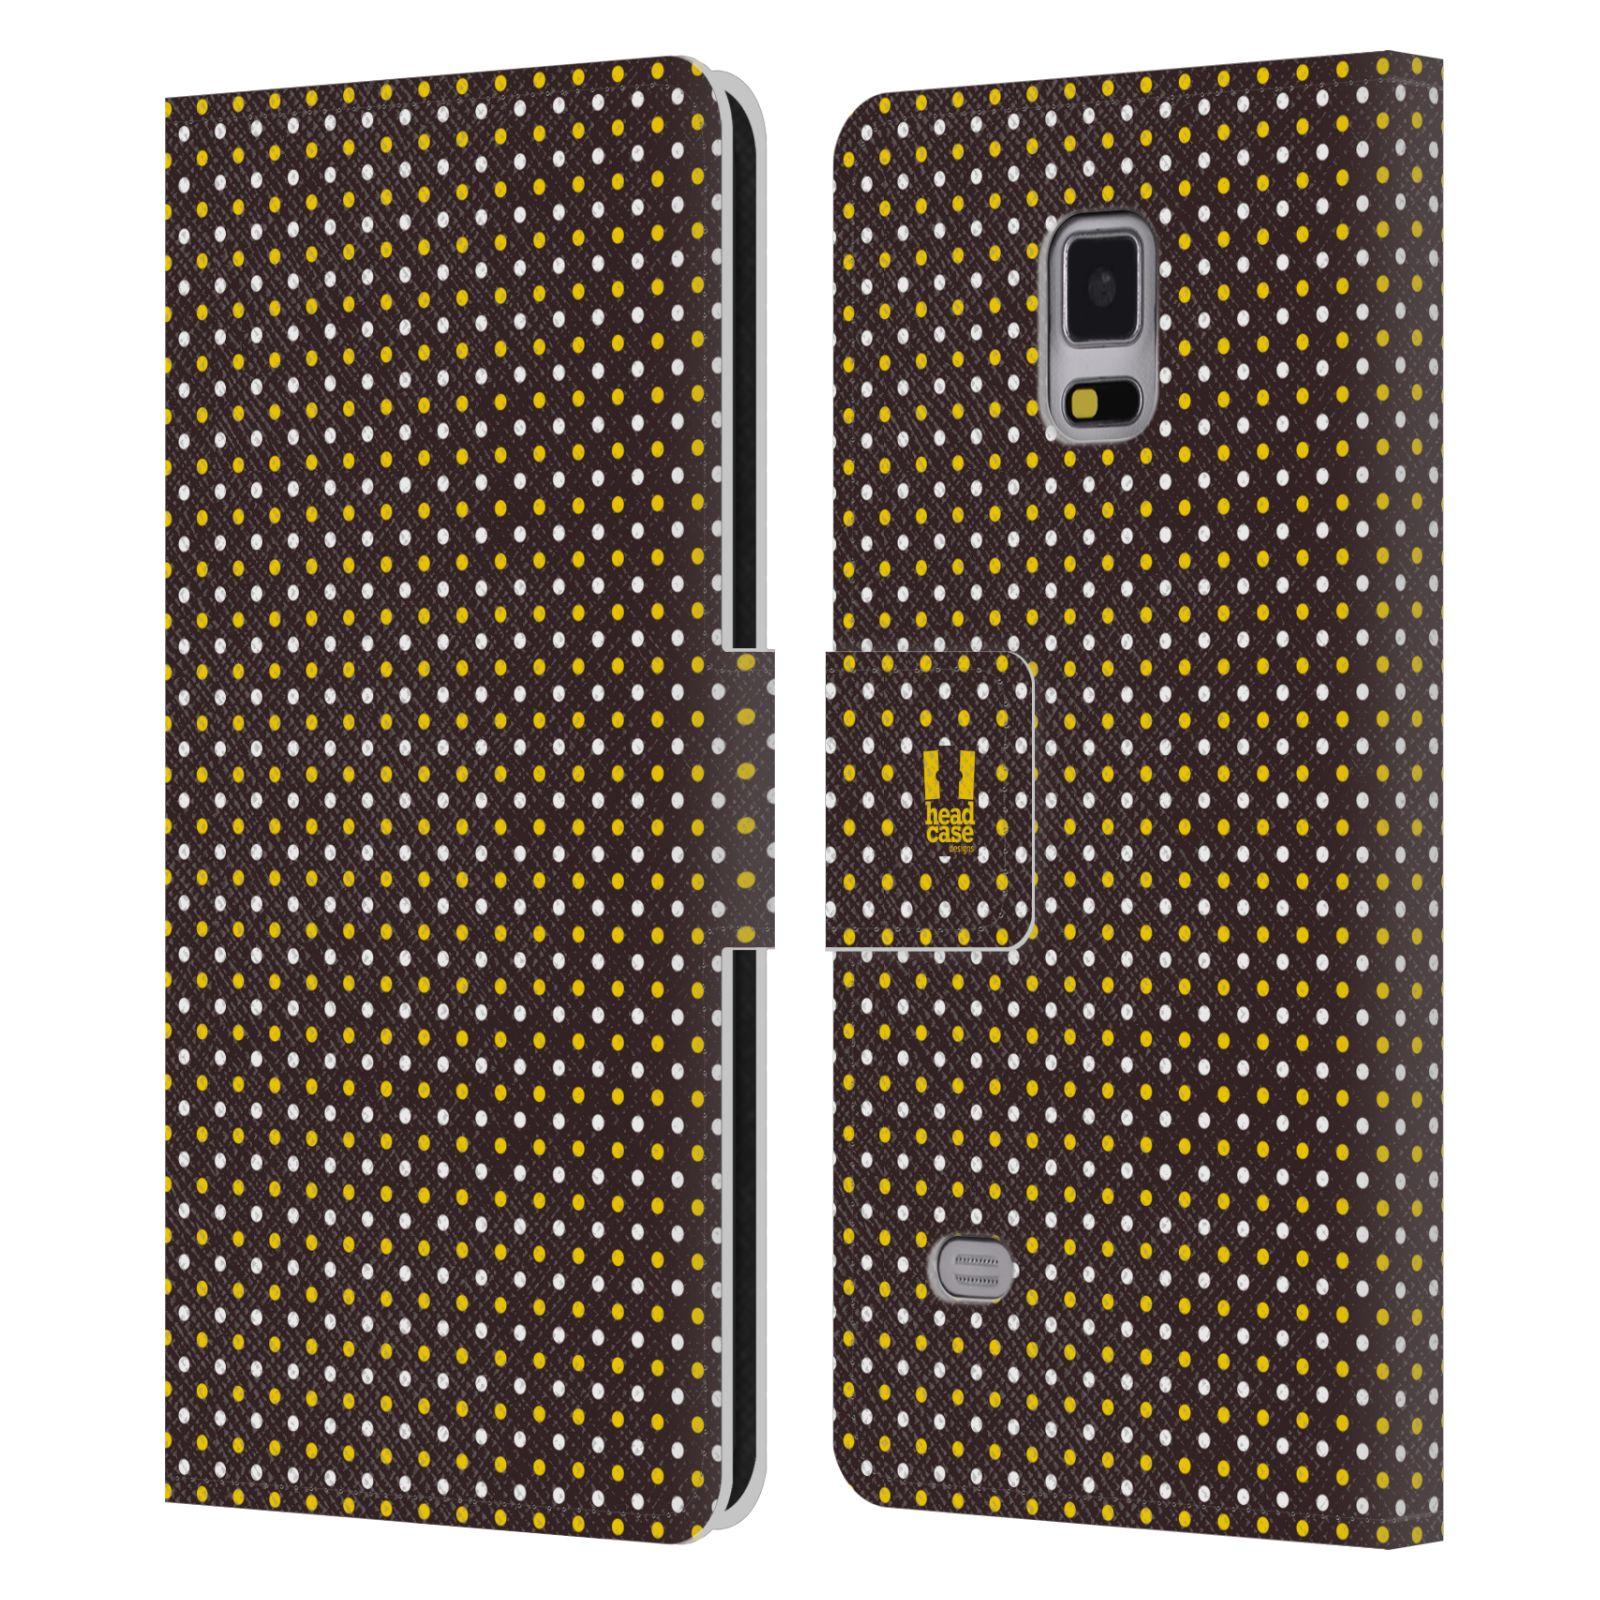 HEAD CASE Flipové pouzdro pro mobil Samsung Galaxy Note 4 VČELÍ VZOR puntíky hnědá a žlutá